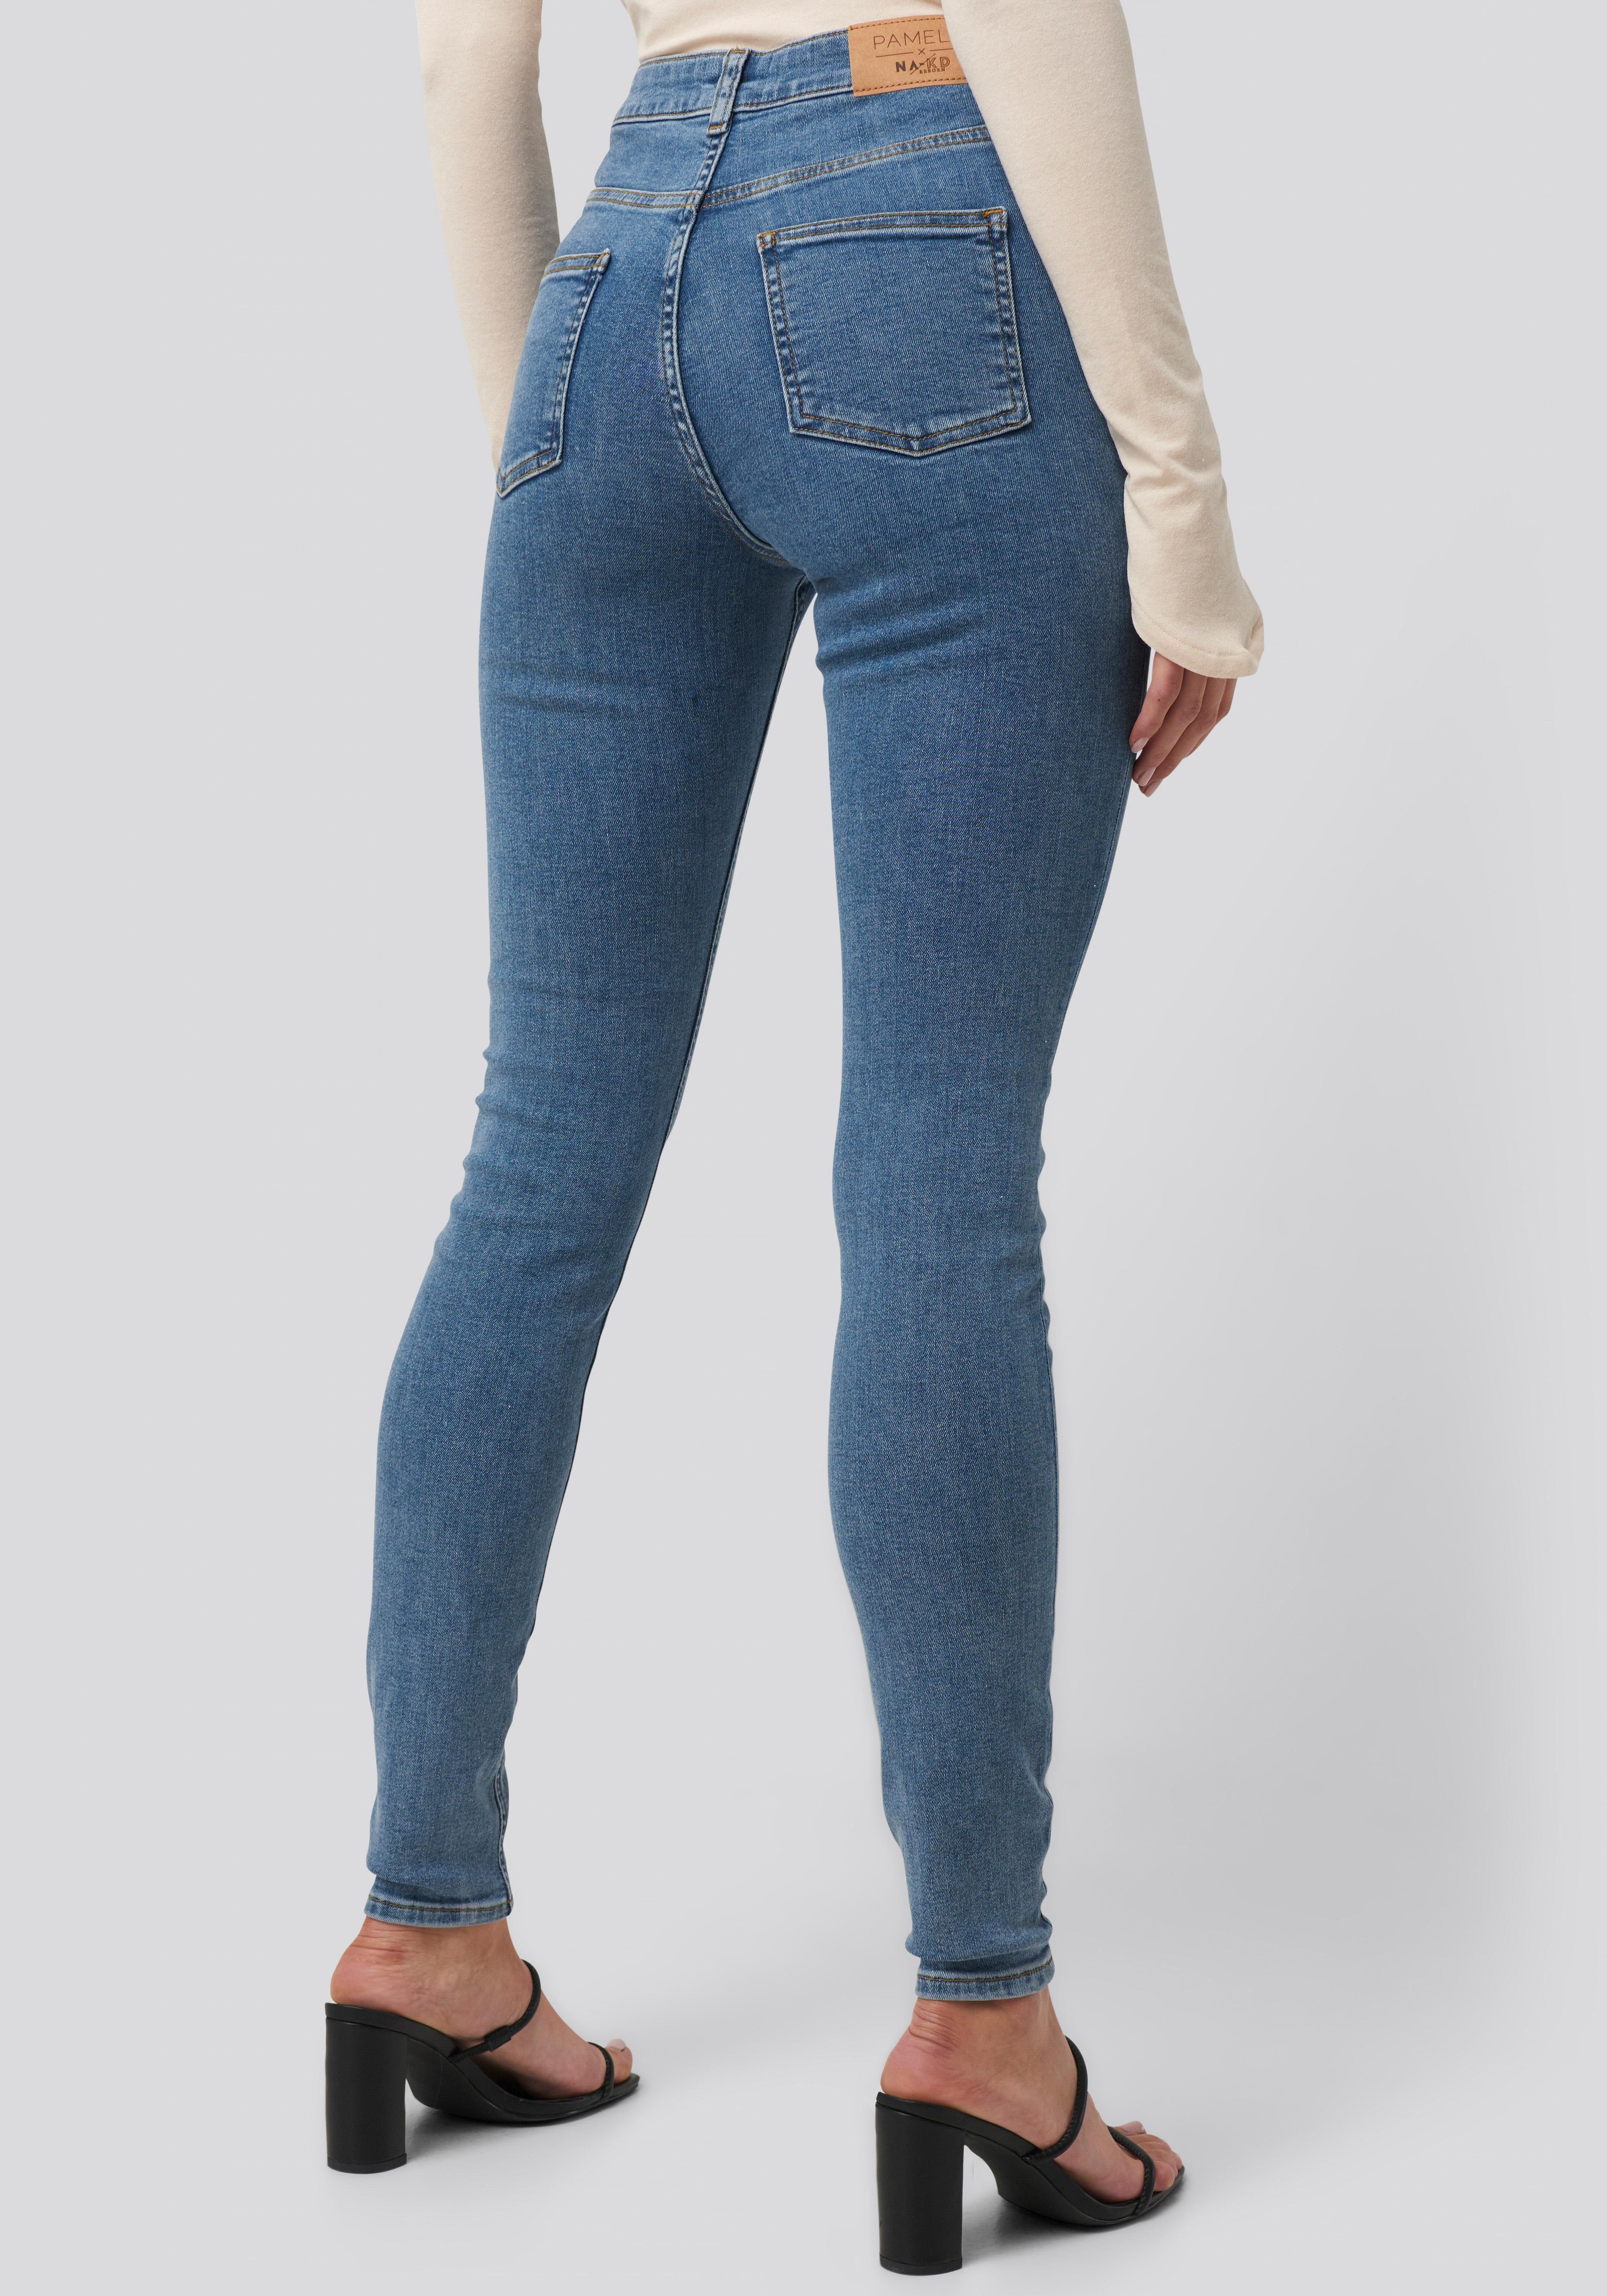 Pamela Reif X NA KD Skinny fit Jeans »Pamela Reif x NA KD« High Waist Jeans, nachhaltig produziert & zertifiziert online kaufen | OTTO